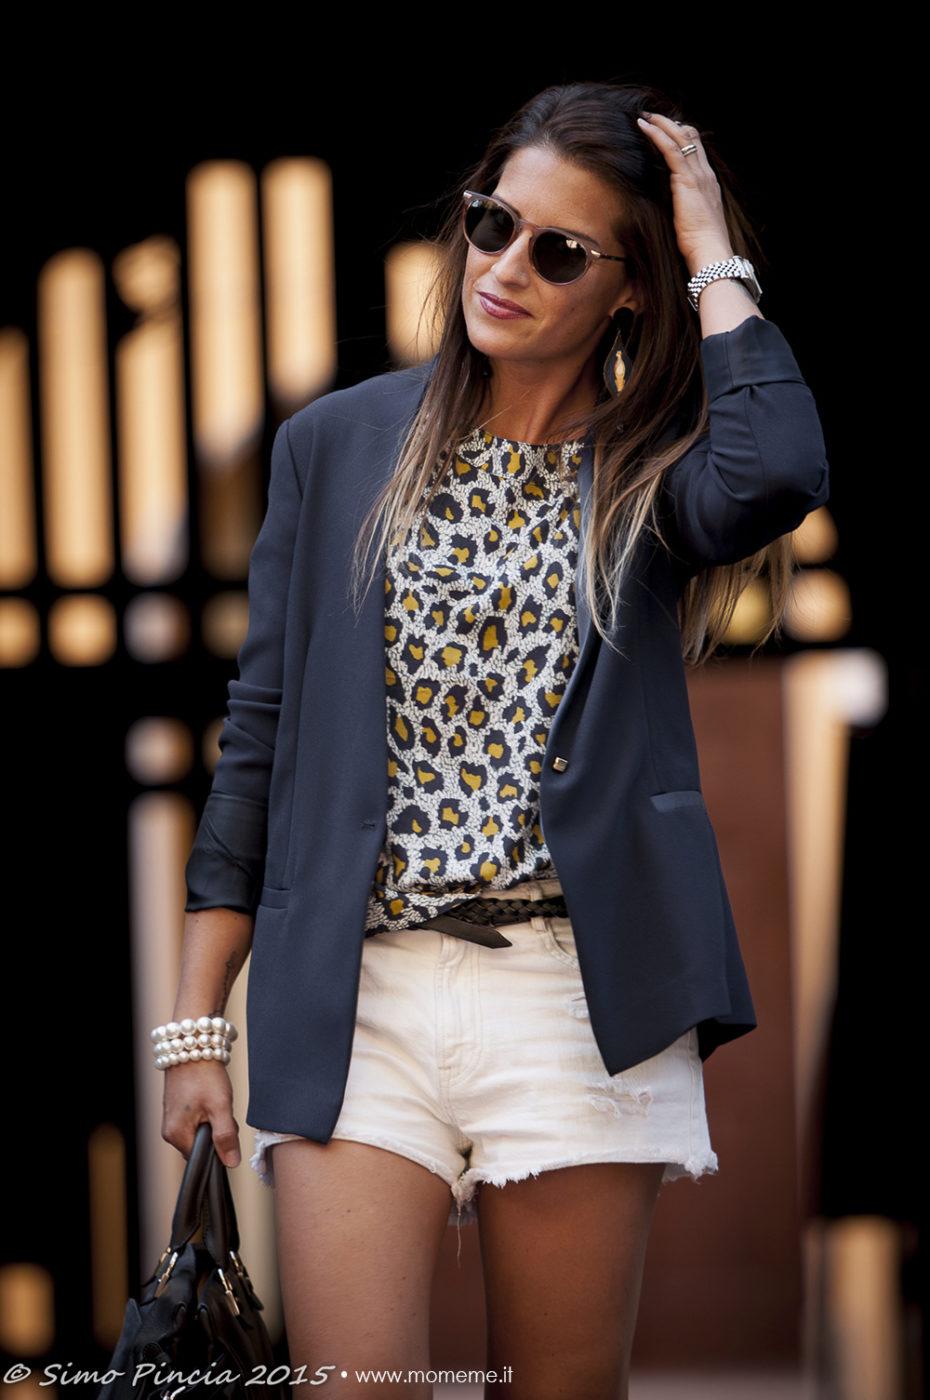 blu_blazer_blusa_animalier_short_jeans_bianco_borsa_chloe_look_donna_occhaili_redele_momeme